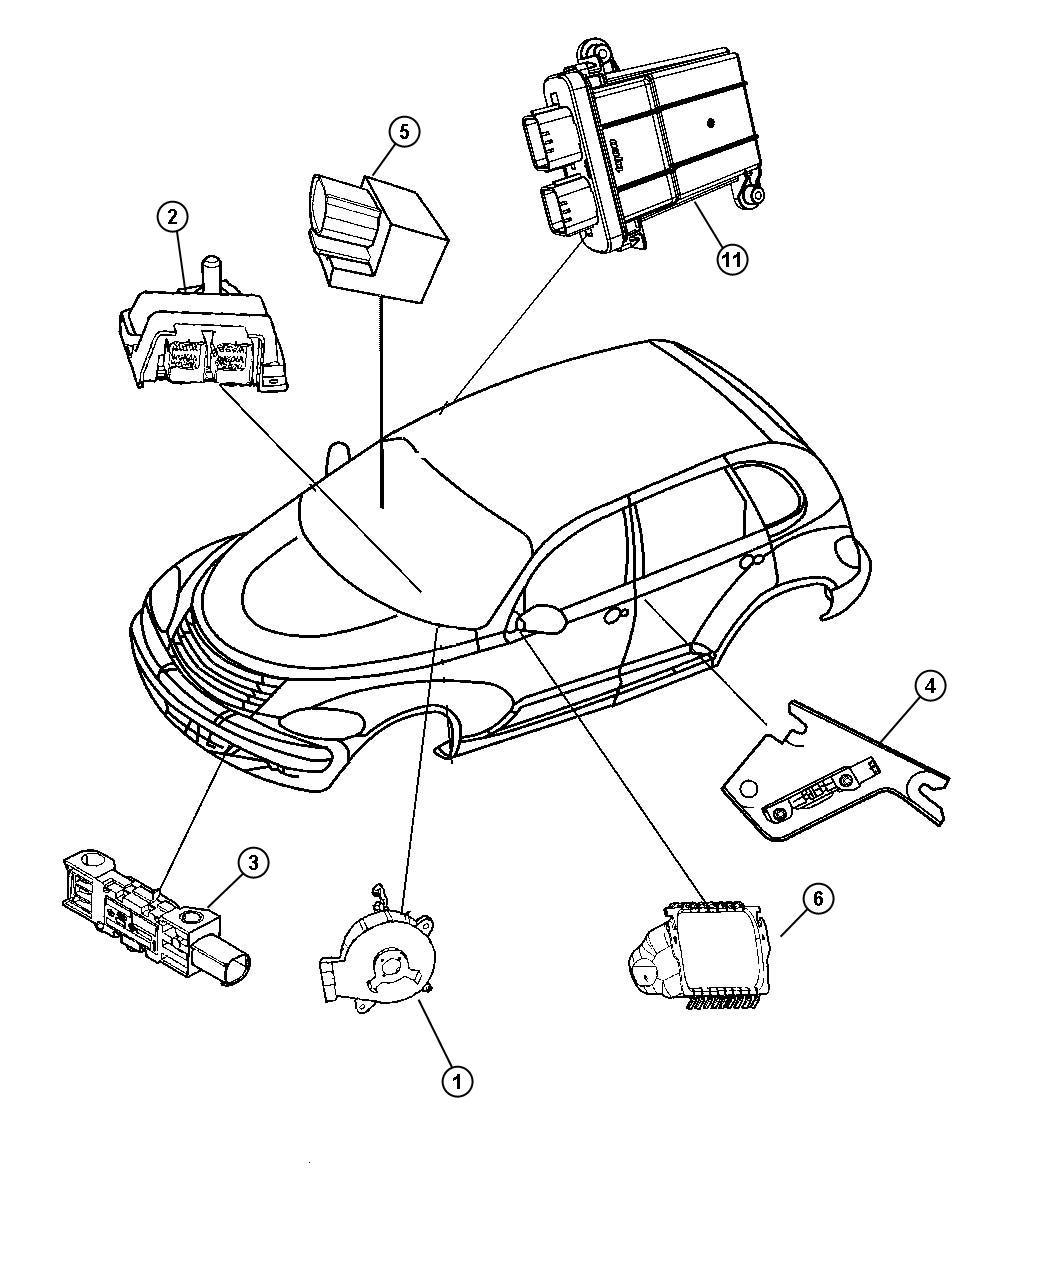 Chrysler Pt Cruiser Air Bag Modules Impact Sensors And